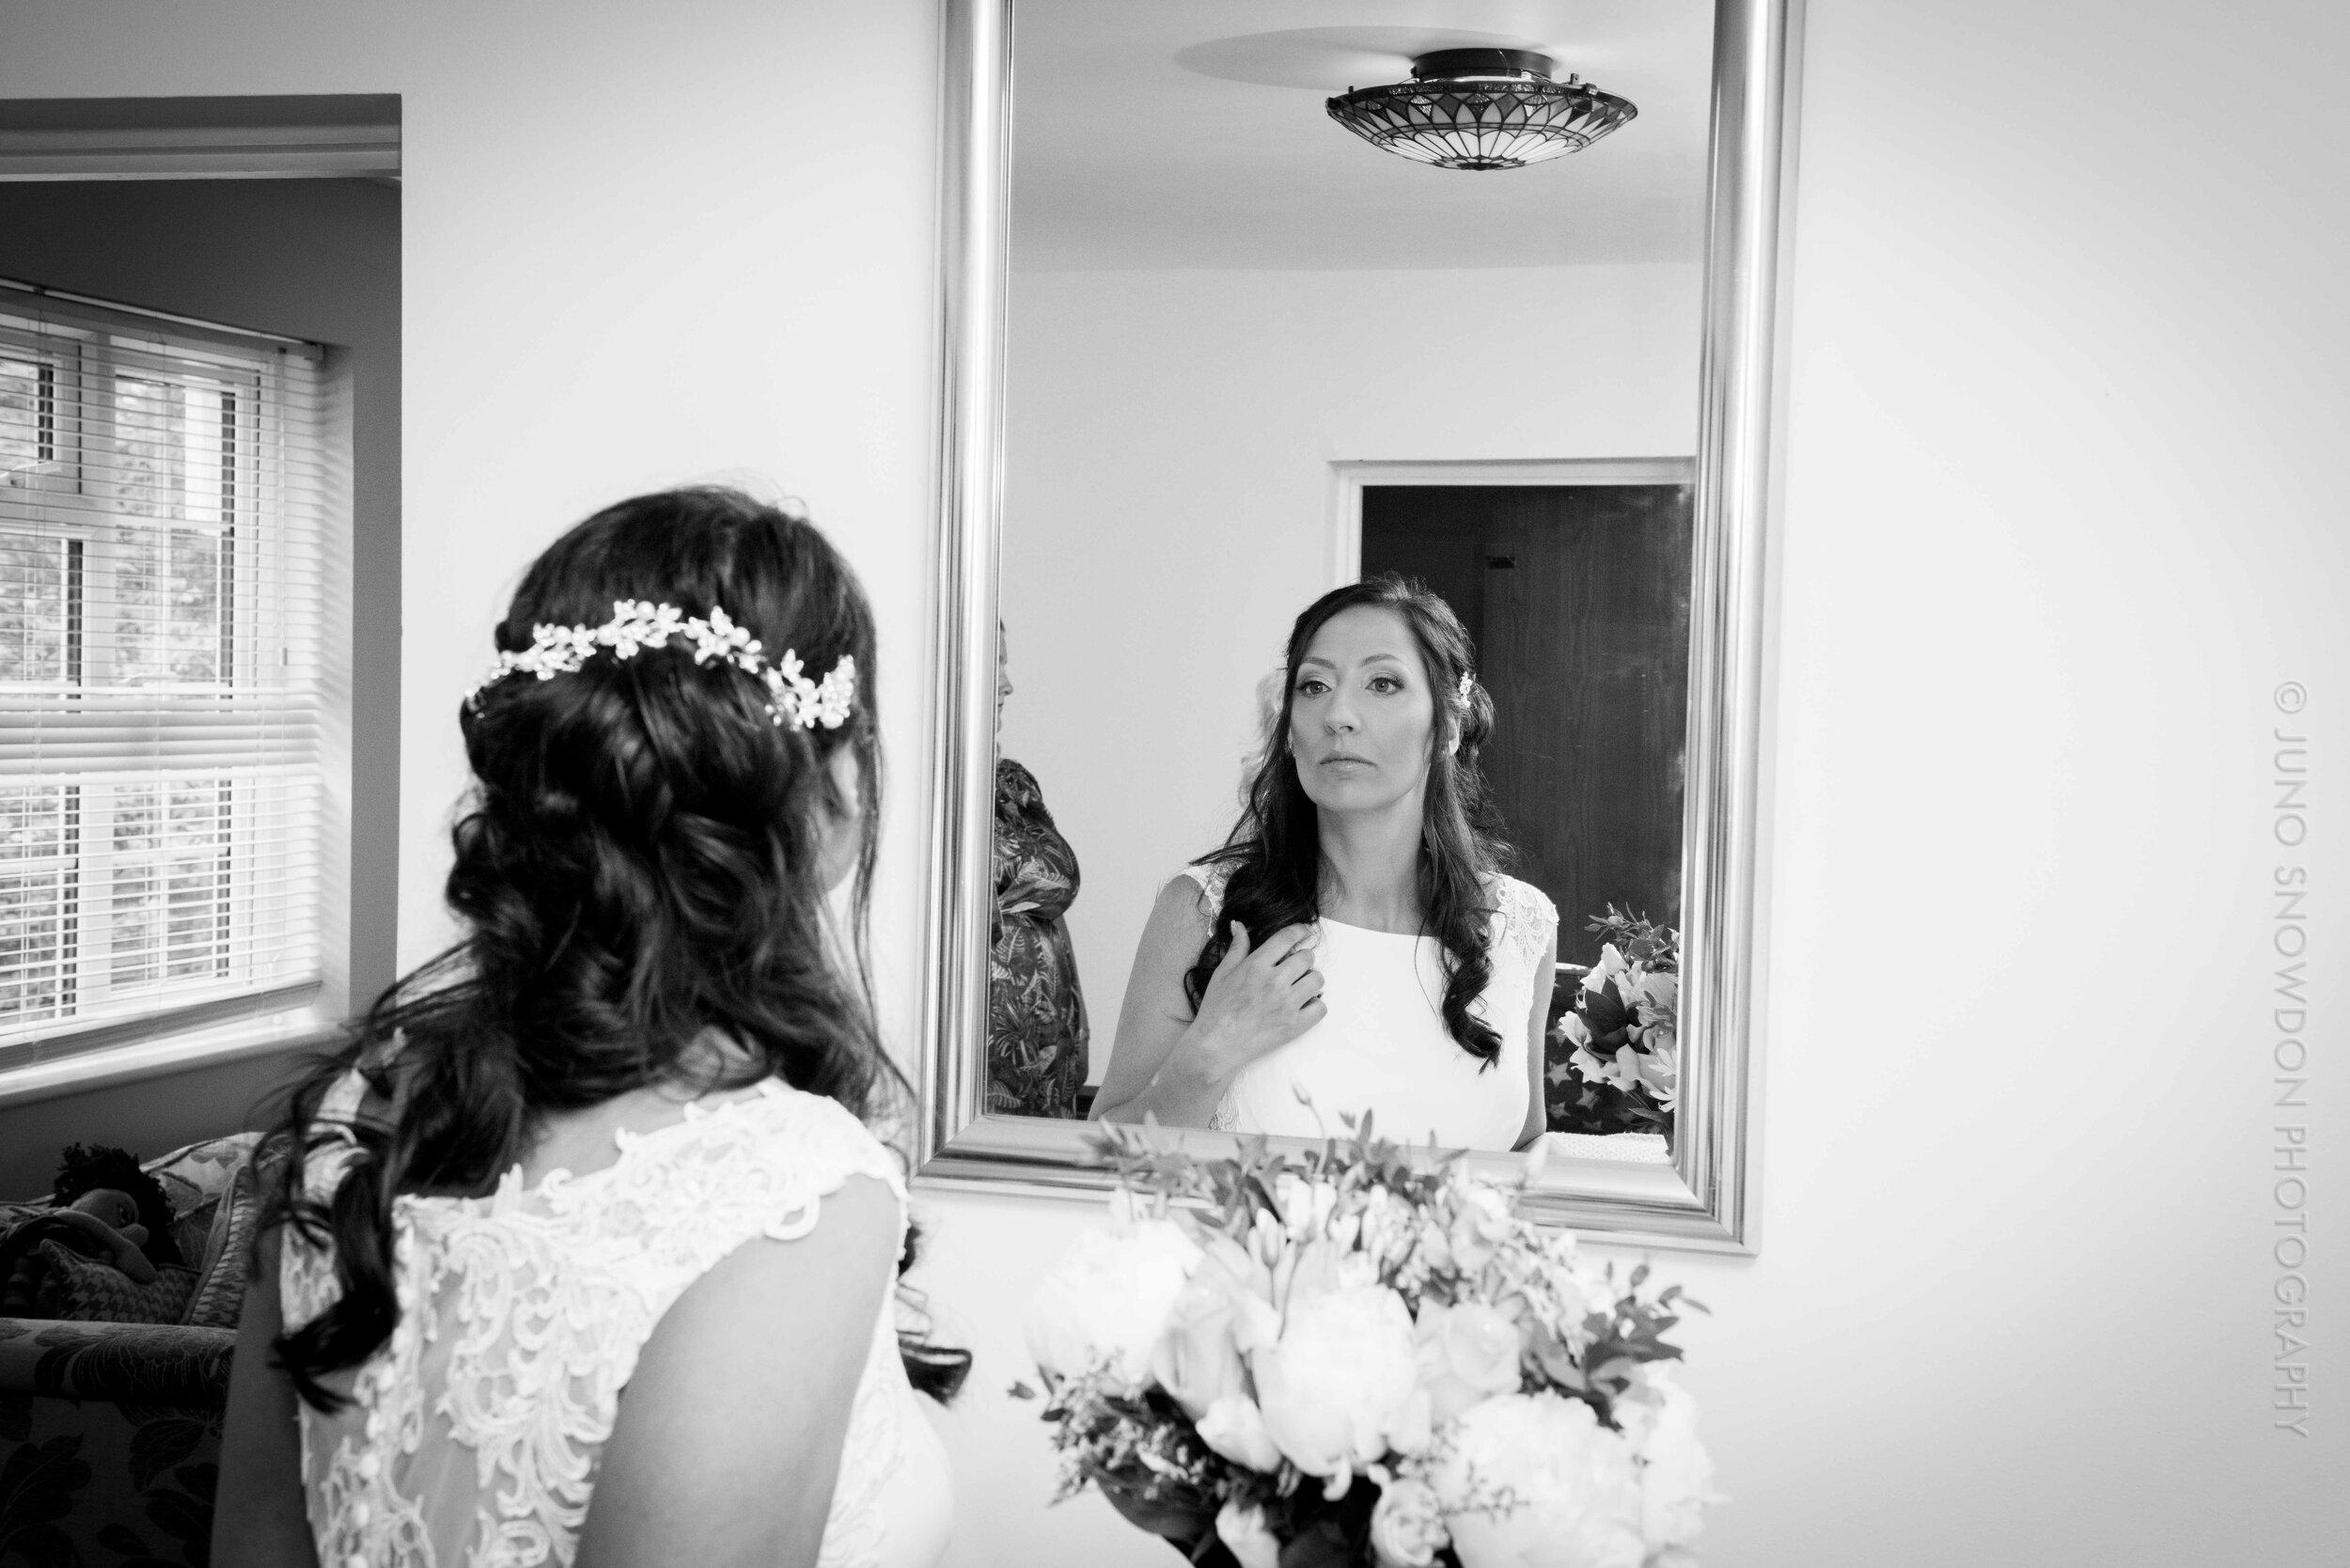 juno-snowdon-photography-wedding-7132.jpg